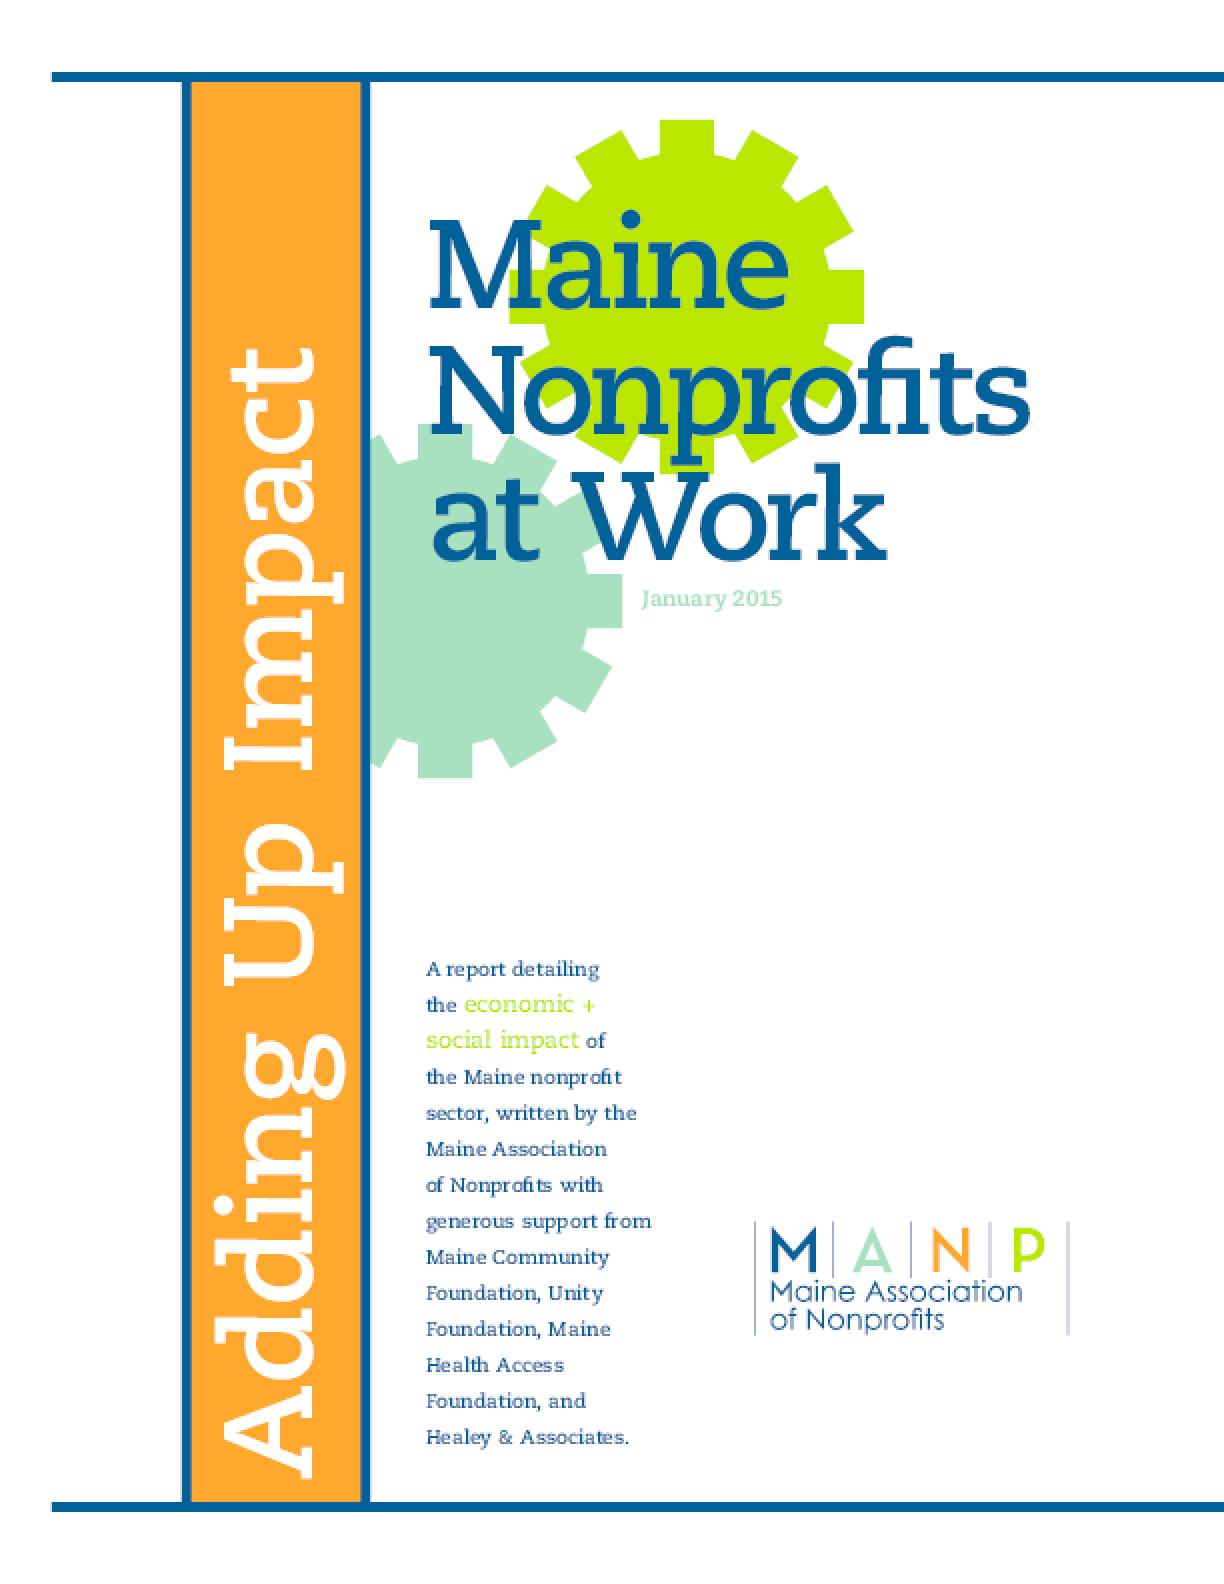 Maine Nonprofits at Work